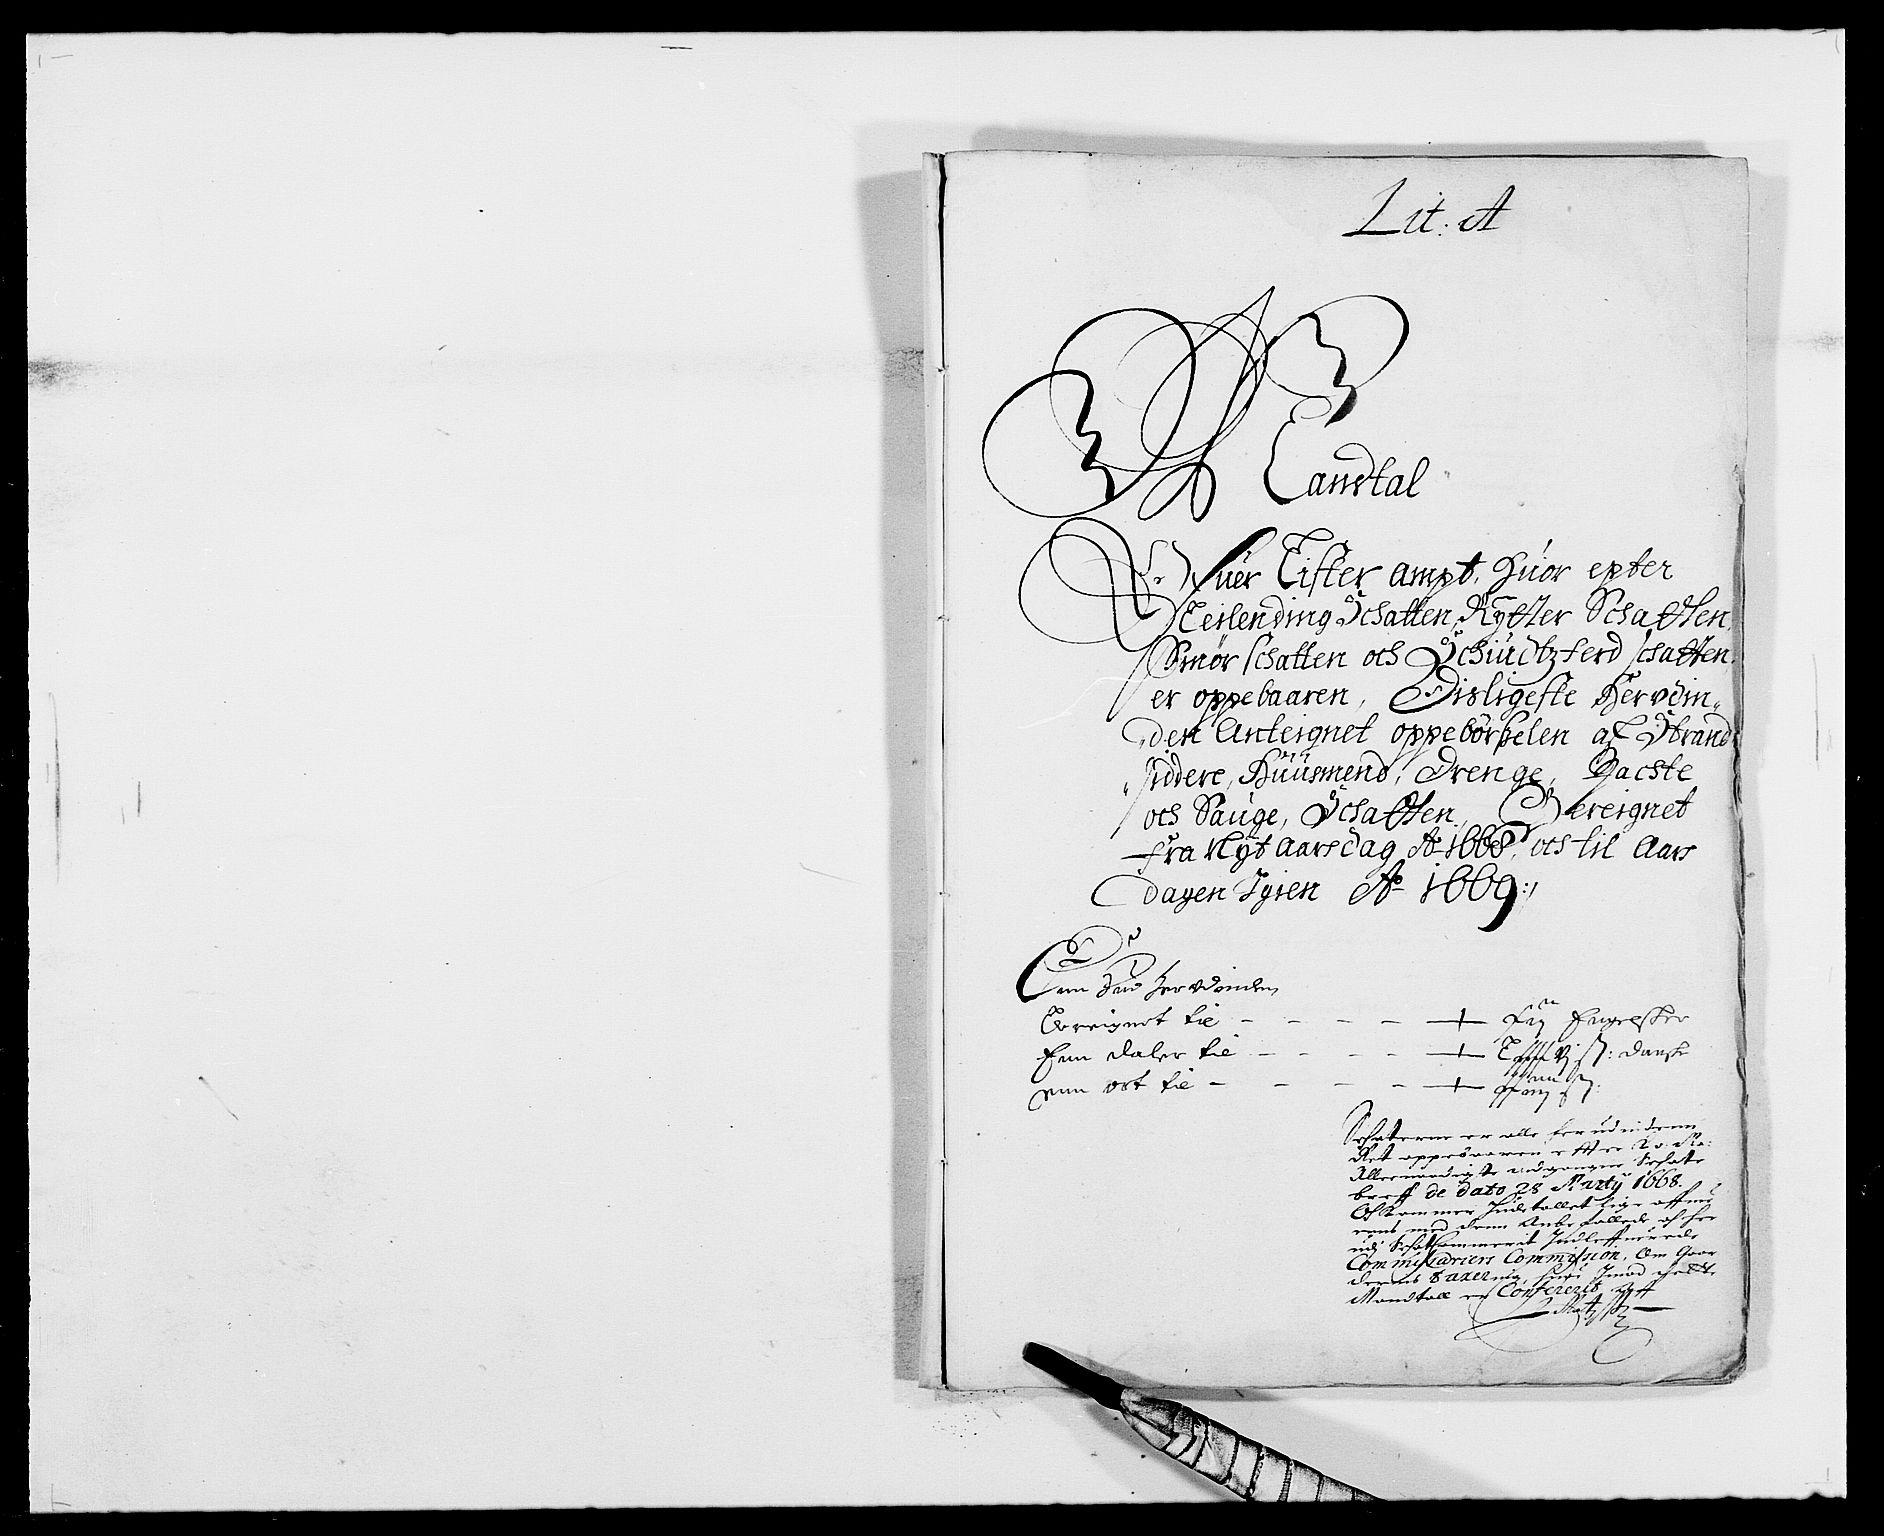 RA, Rentekammeret inntil 1814, Reviderte regnskaper, Fogderegnskap, R41/L2524: Fogderegnskap Lista, 1665-1668, s. 346